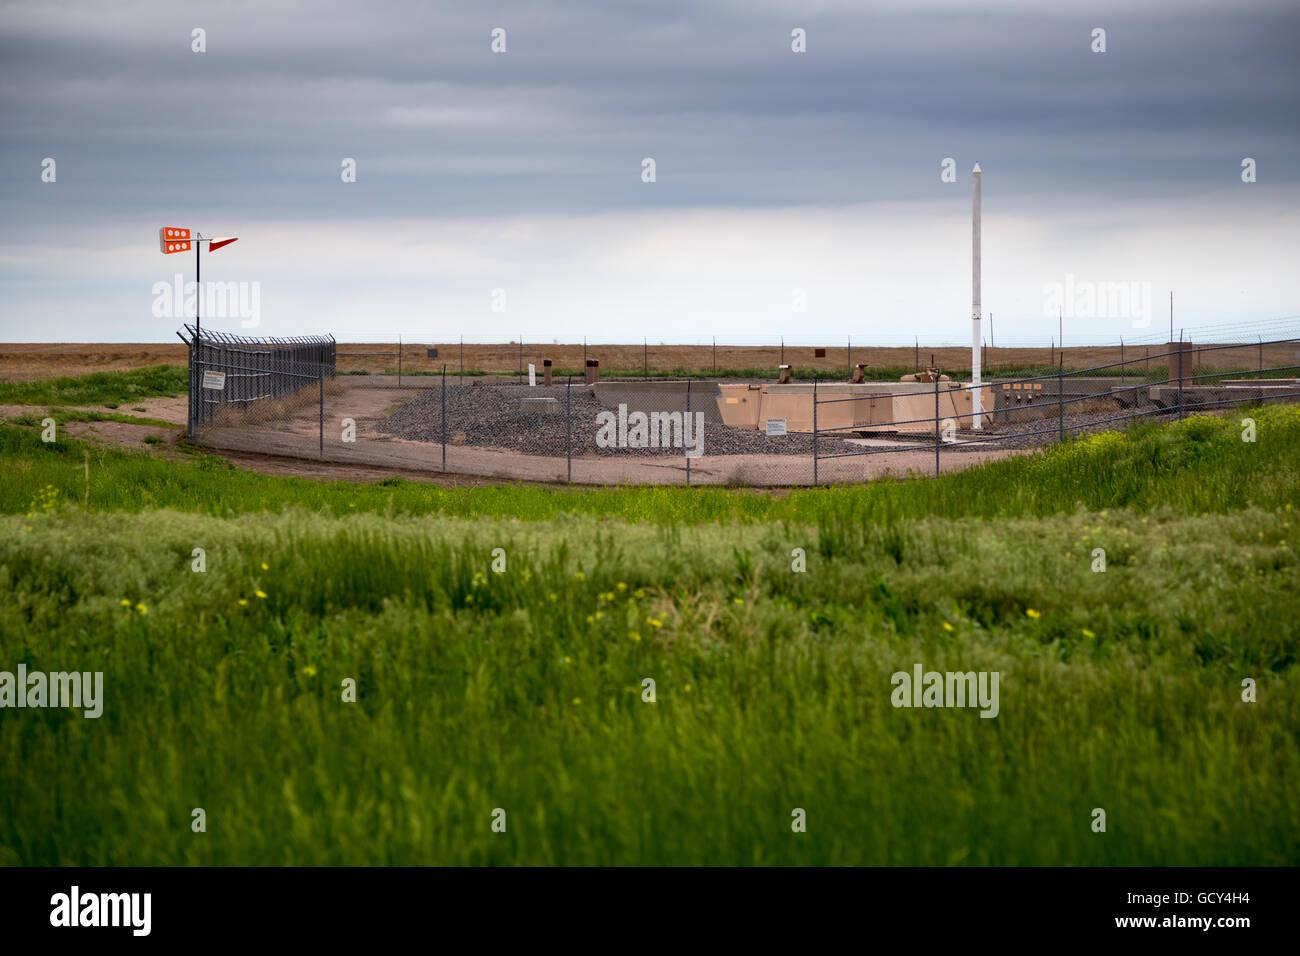 A Minuteman Nuclear Missile Silo near Gurley, Nebraska, June 1, 2014. - Stock Image